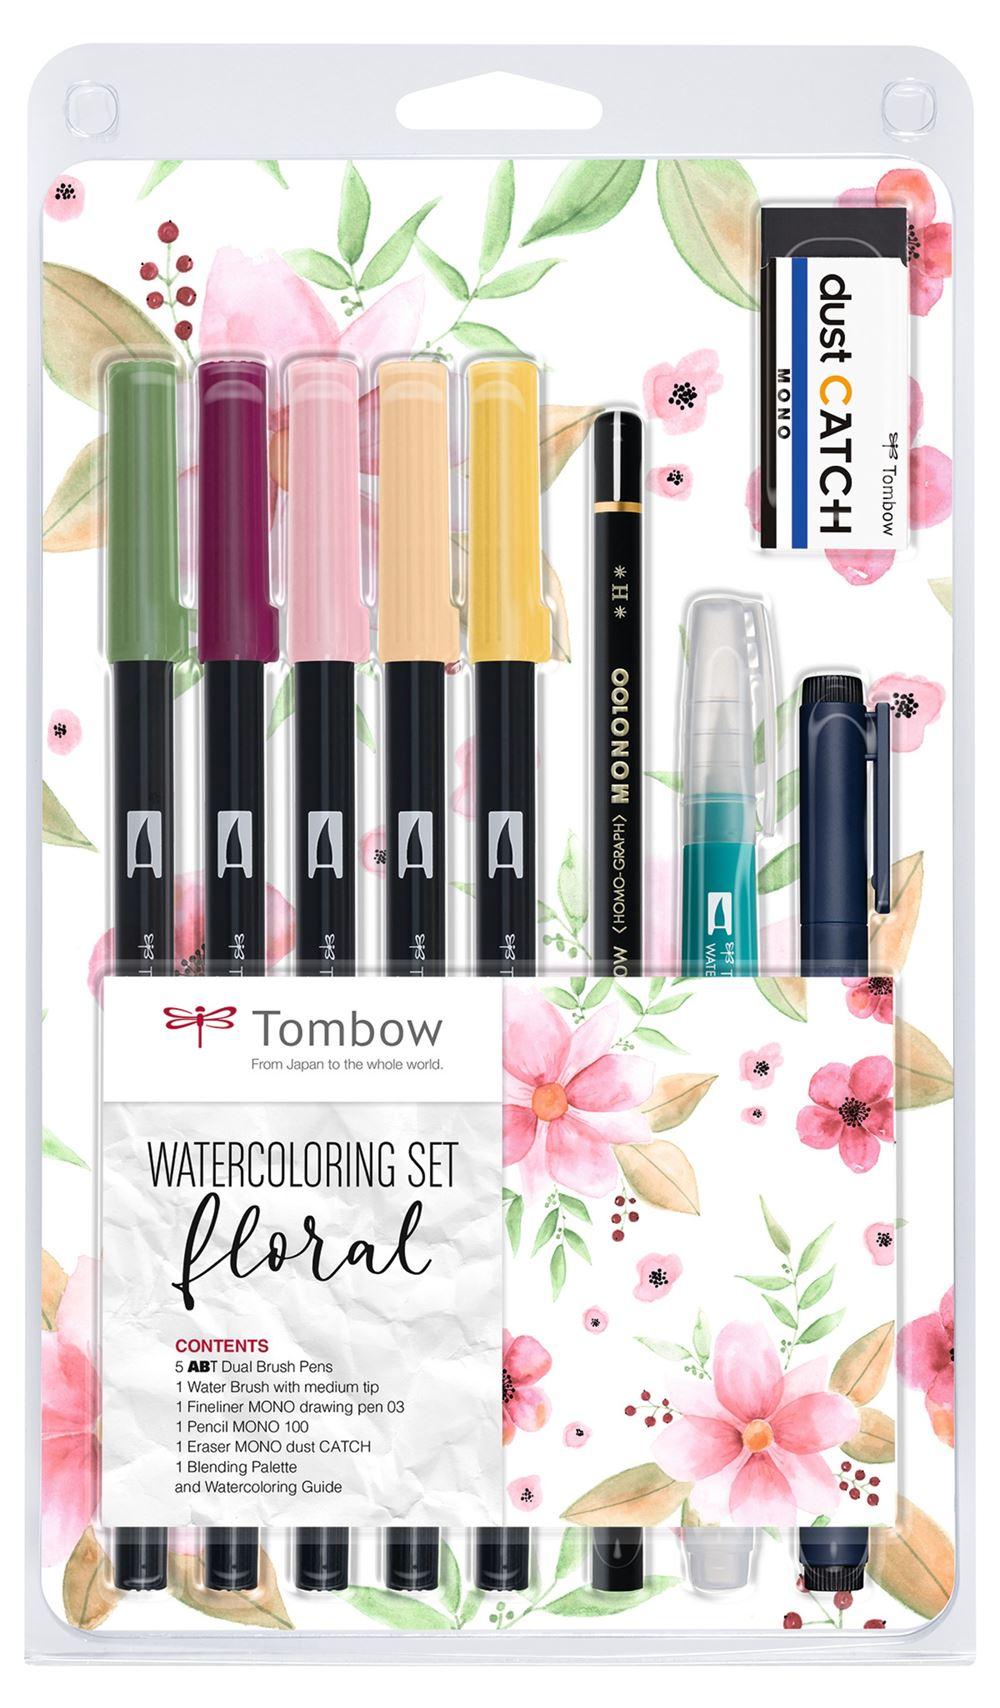 Tombow Watercoloring set